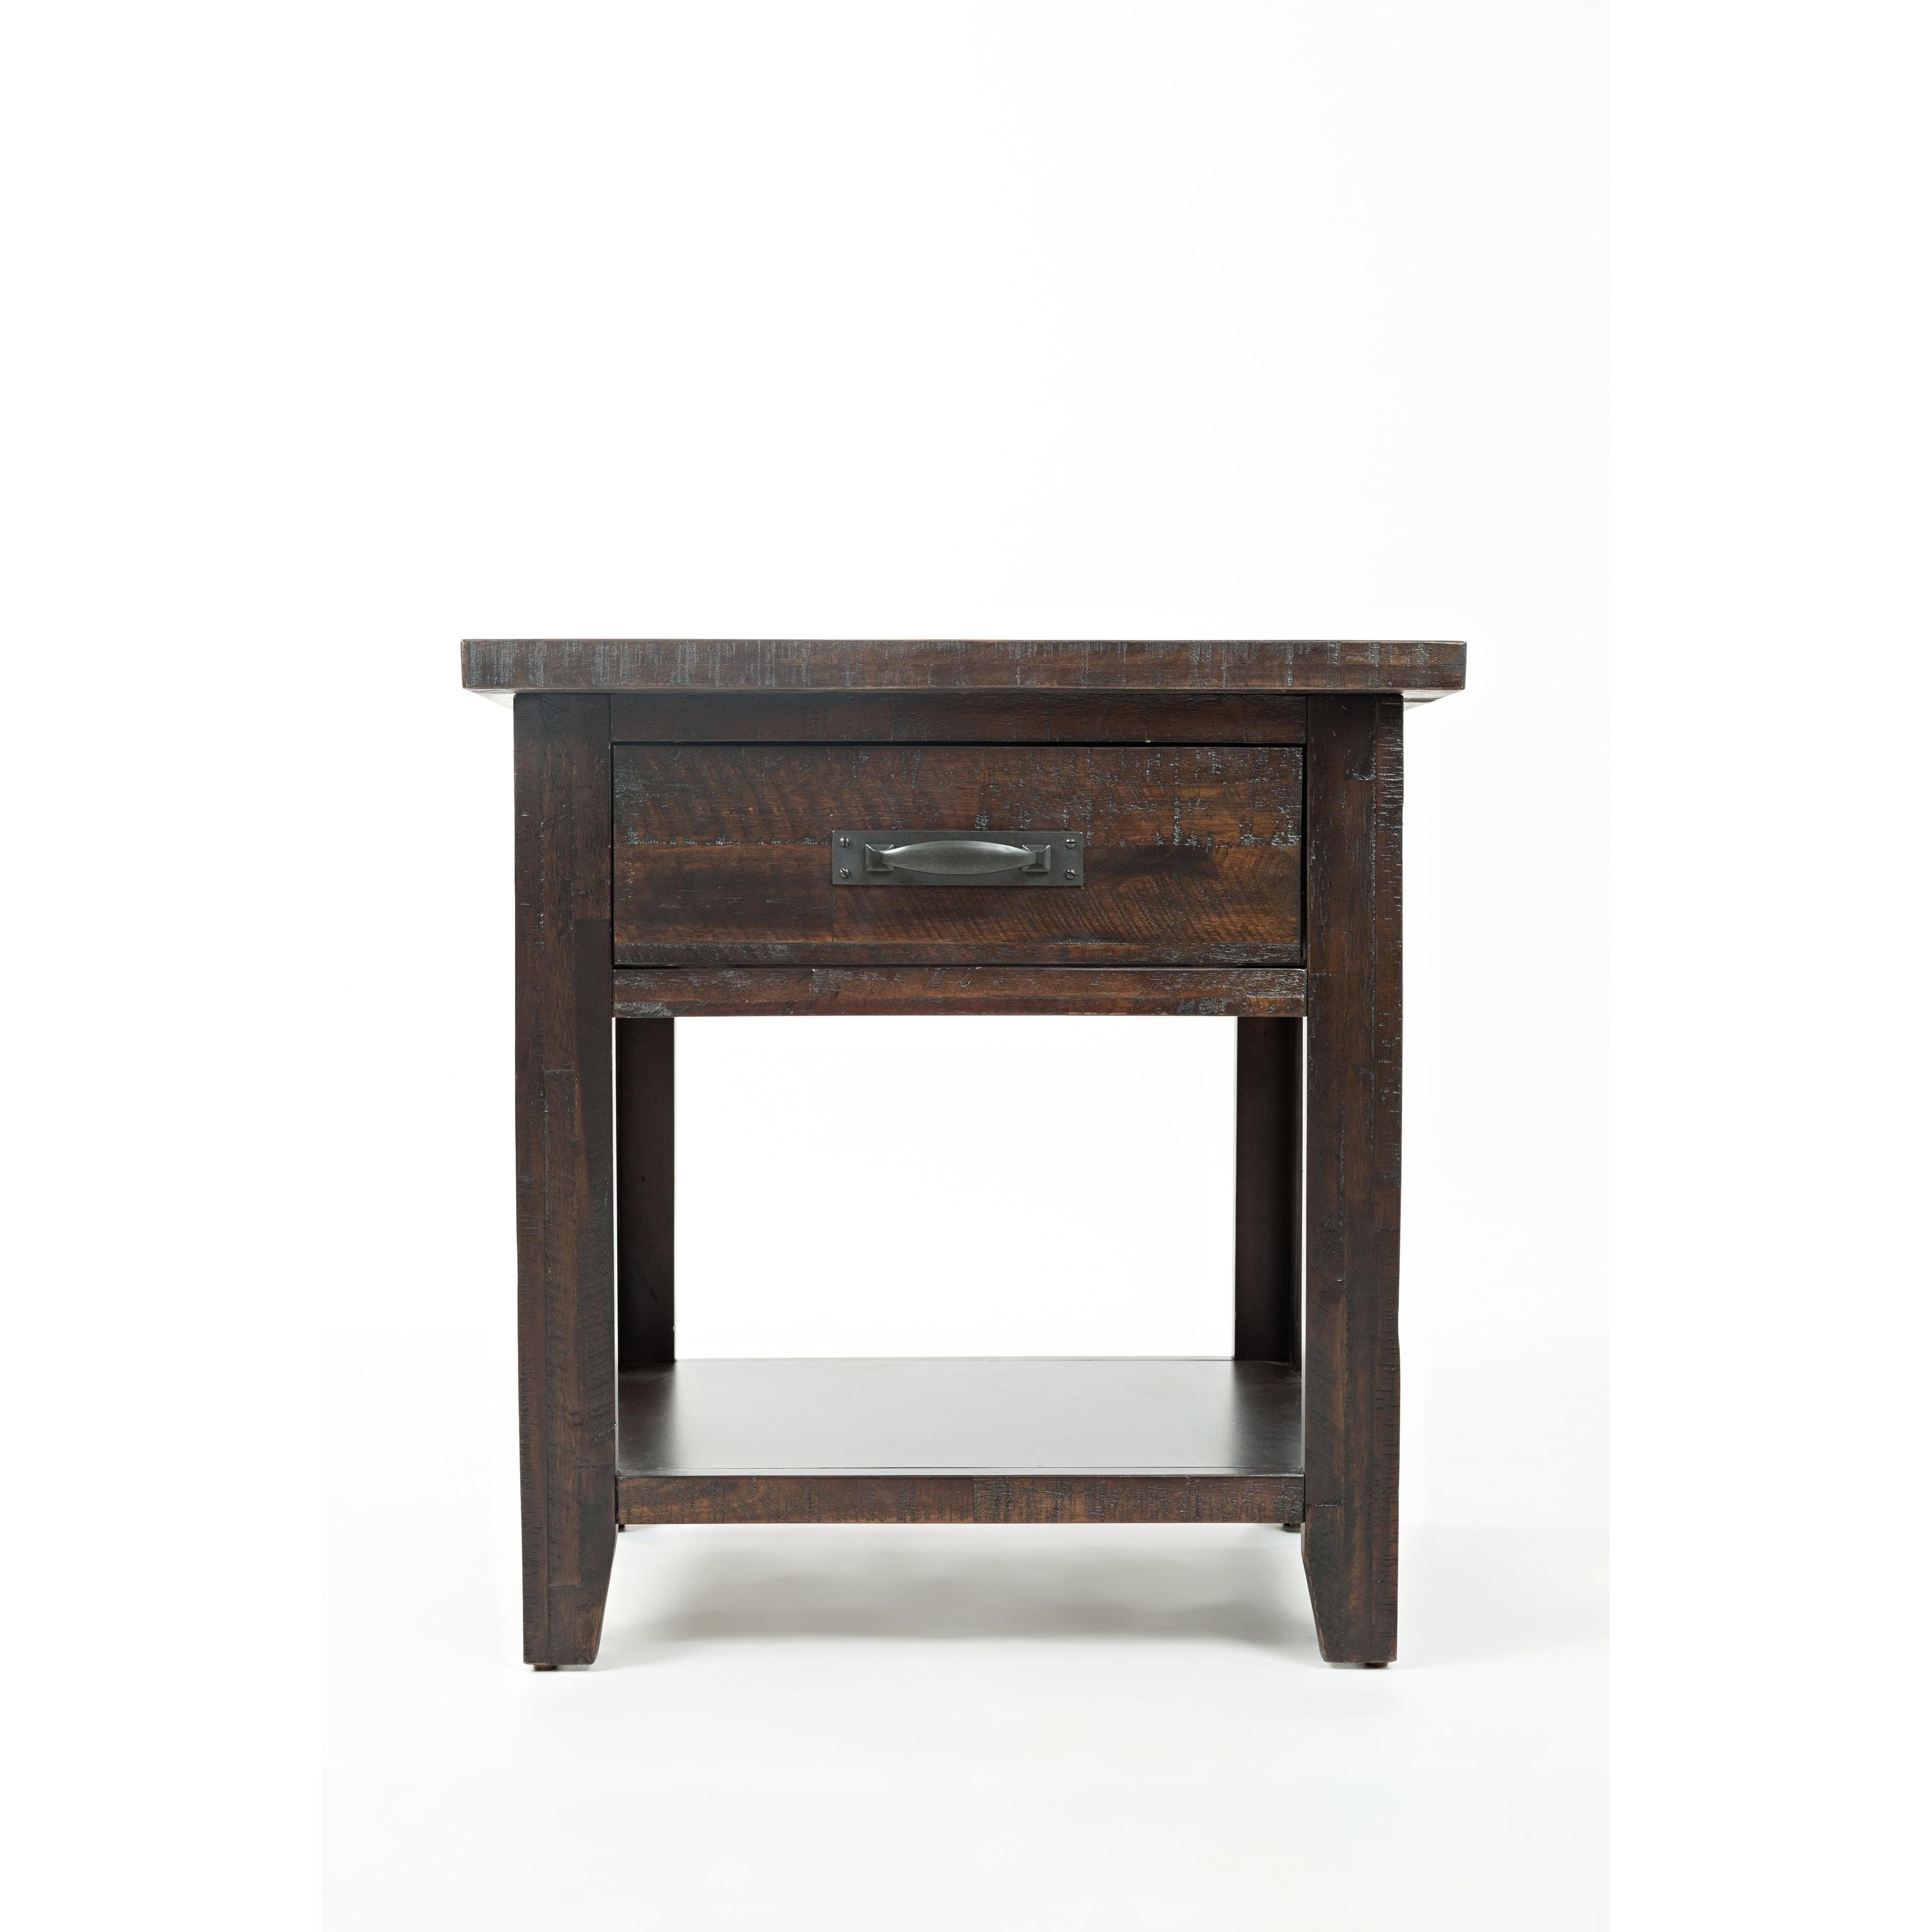 Transitional Wood Metal Nightstand With Bottom Shelf Dark Brown